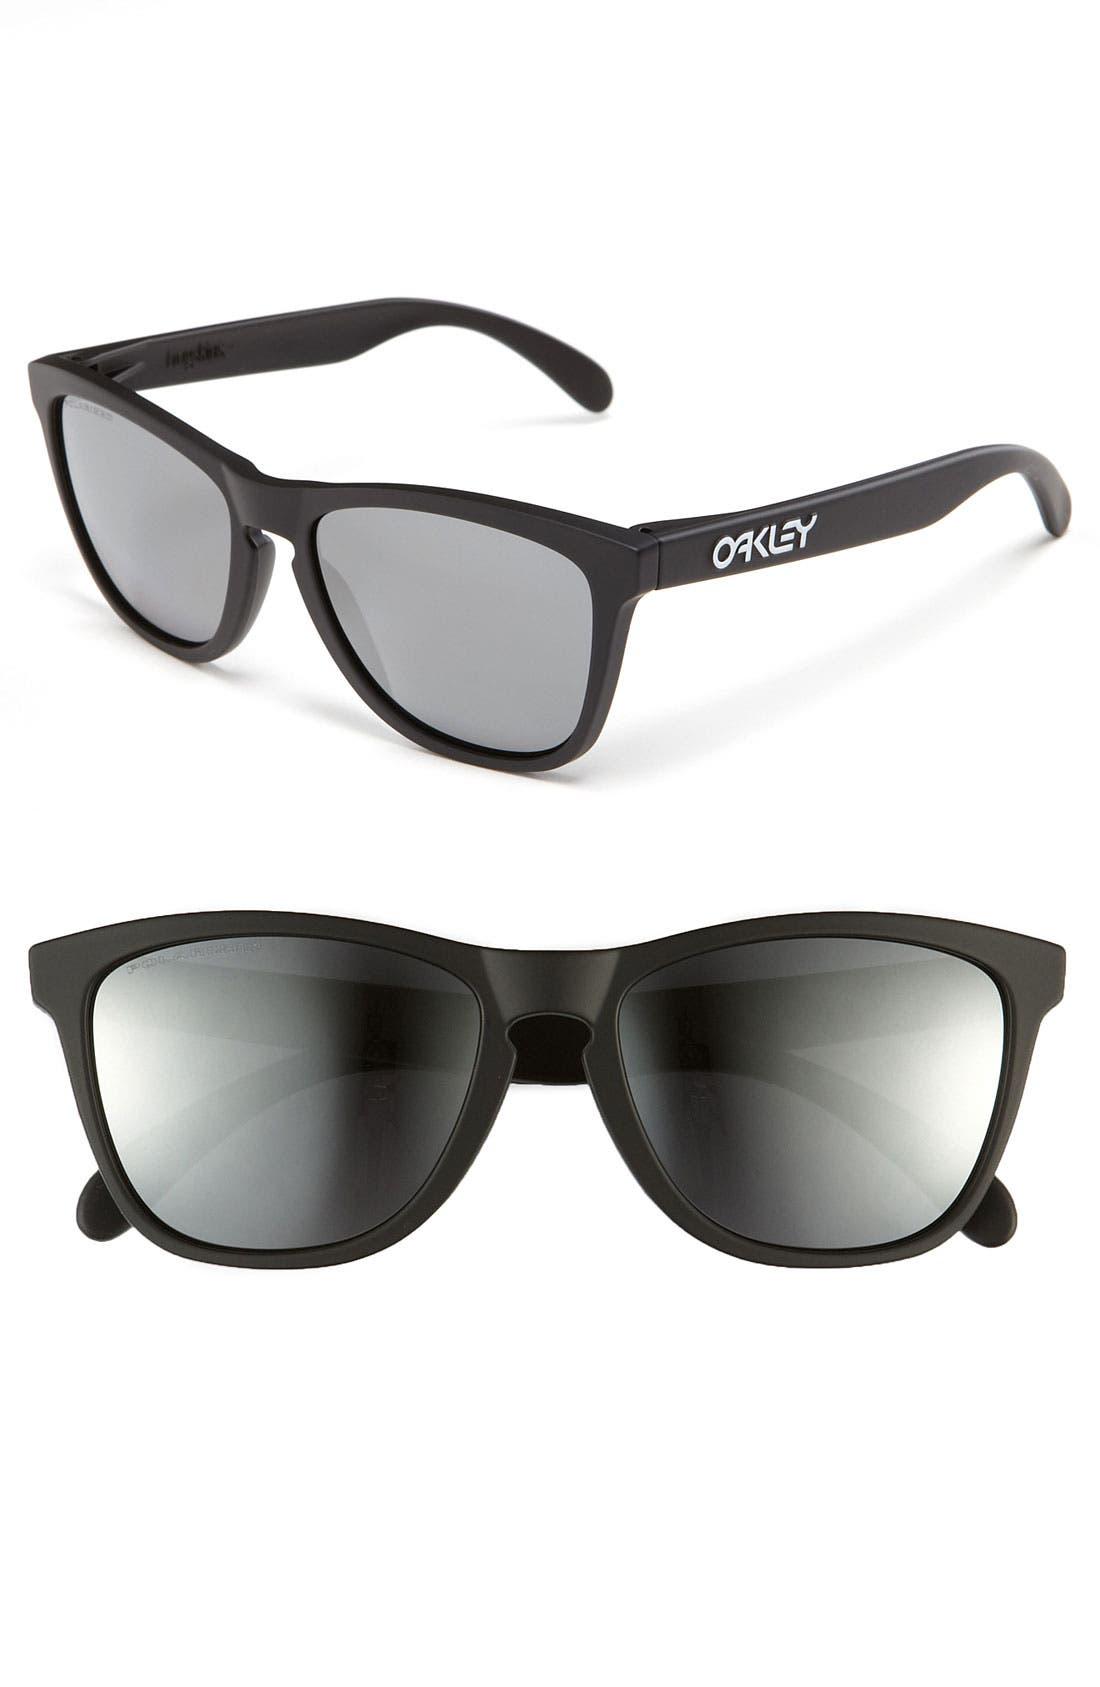 Oakley 57mm Polarized Sunglasses